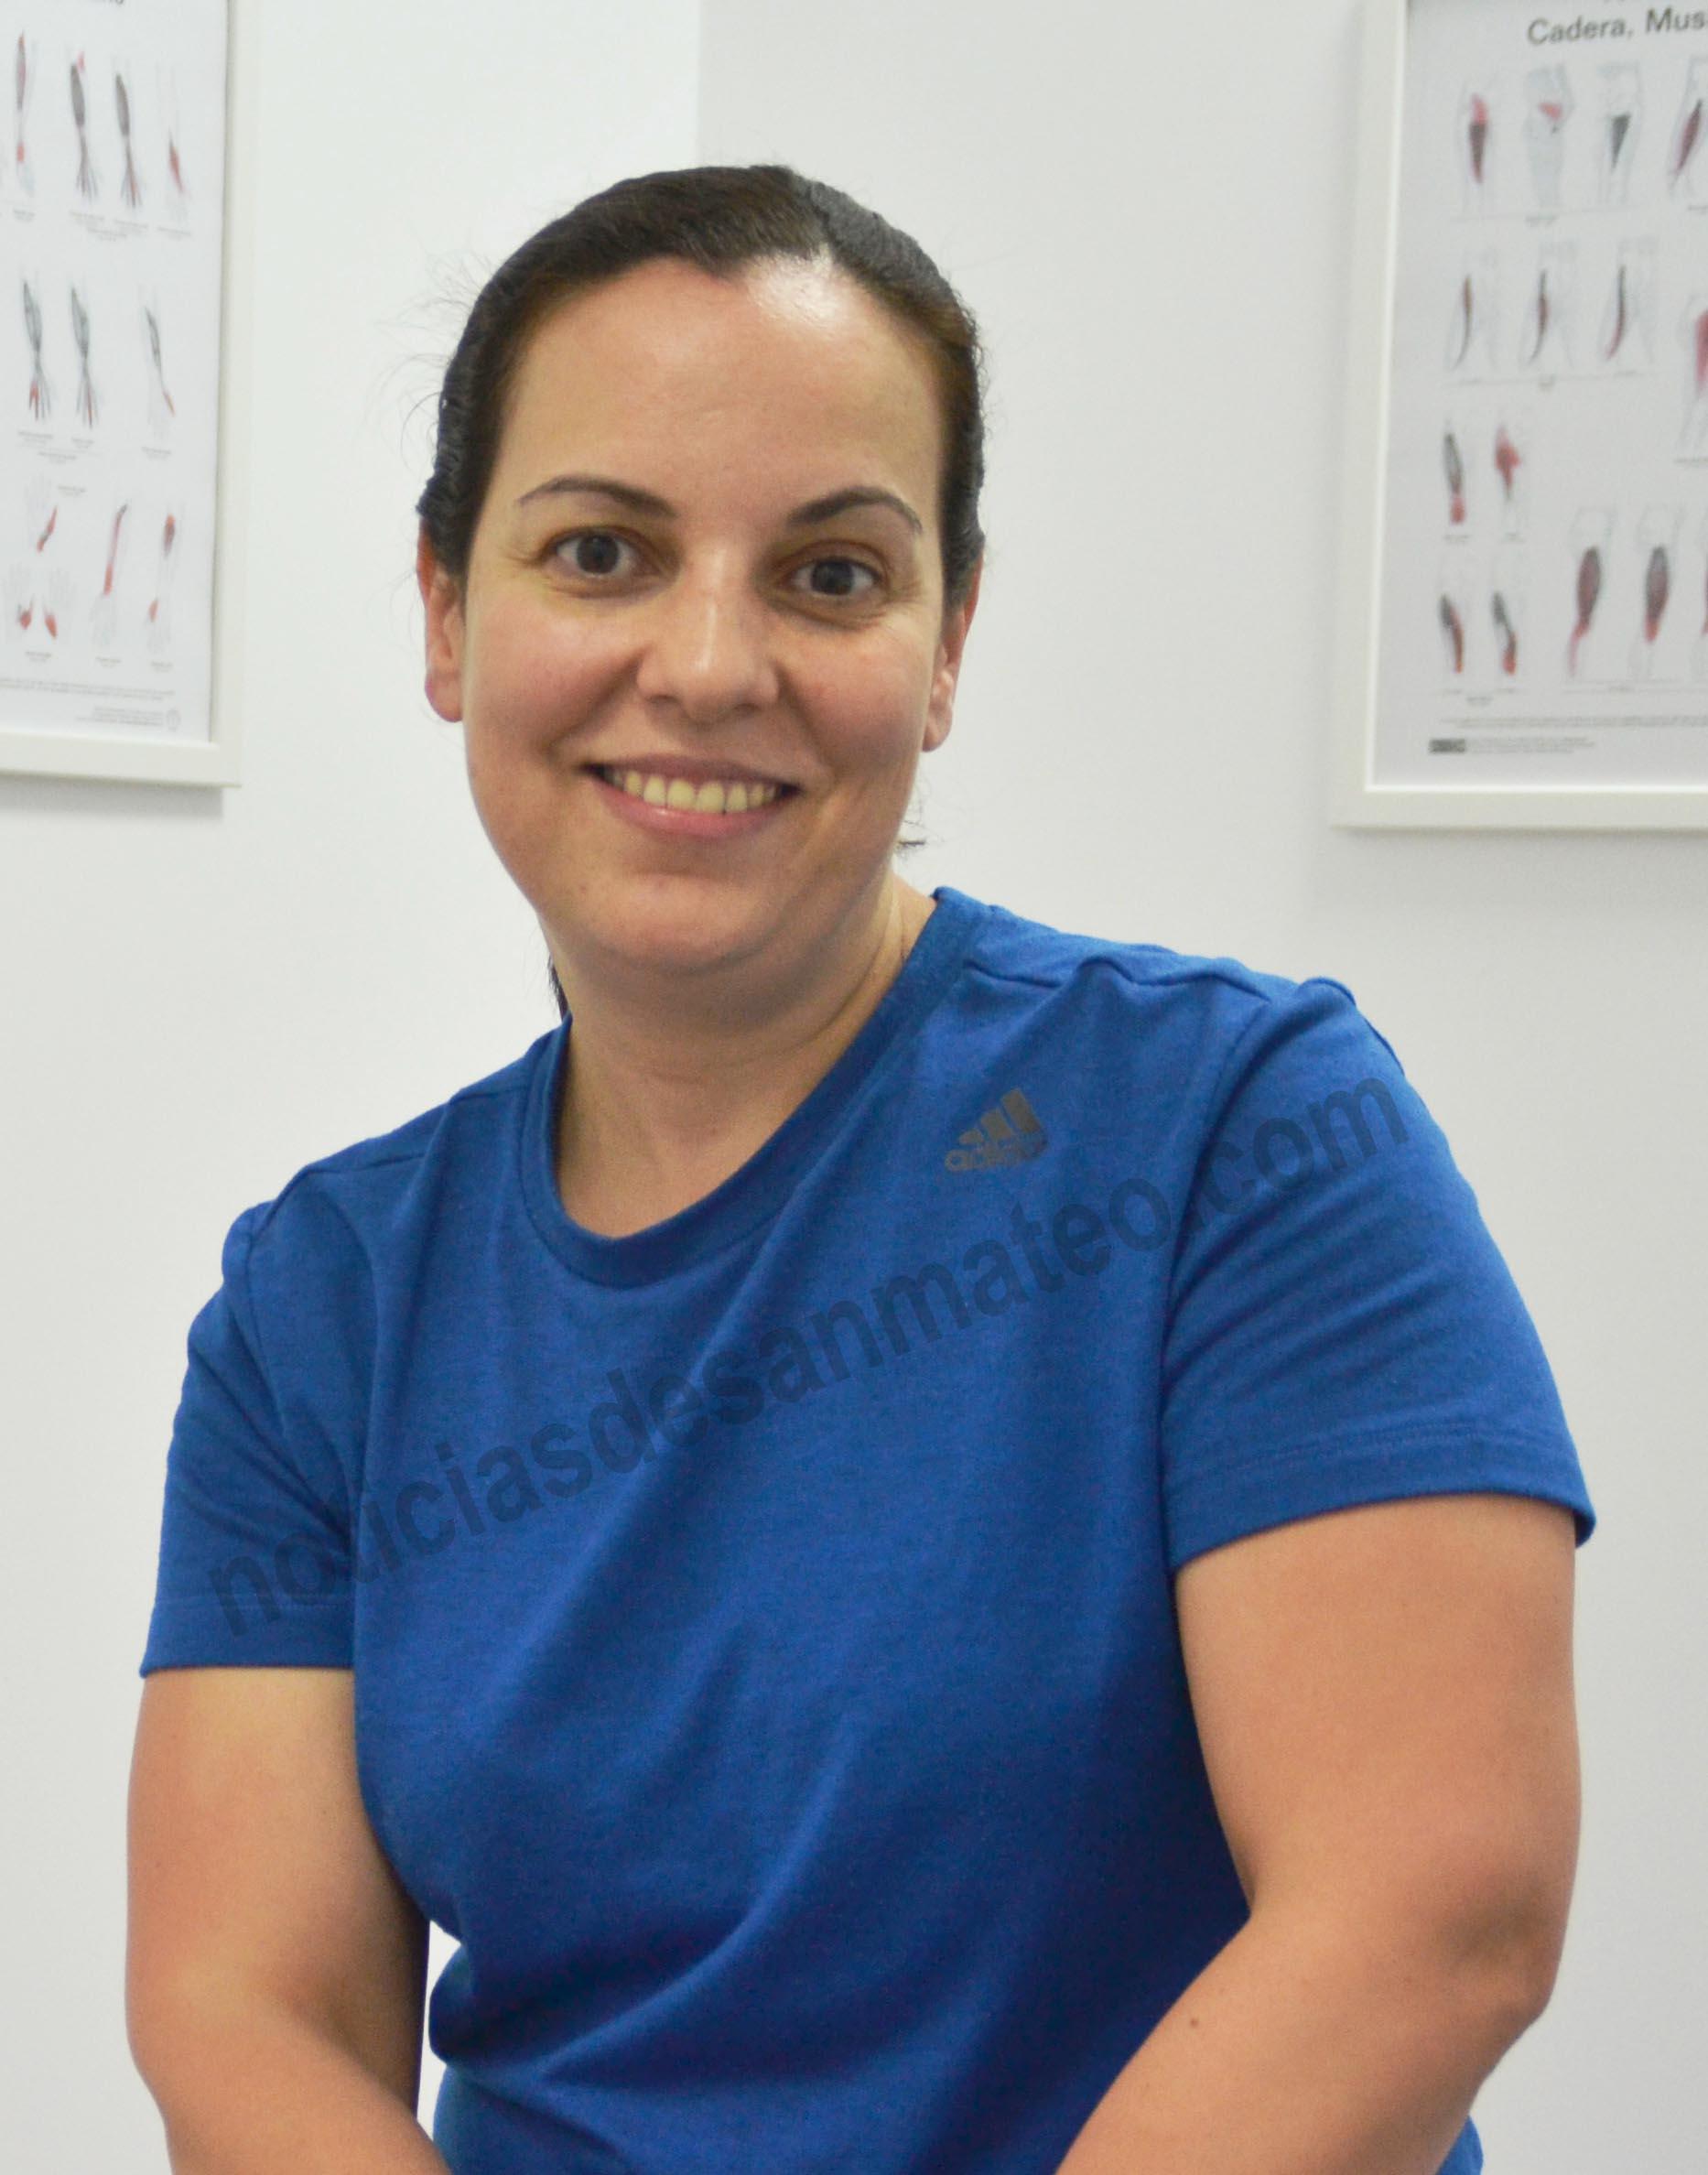 Carolina Devora Fisioterapeuta Noticias de San Mateo